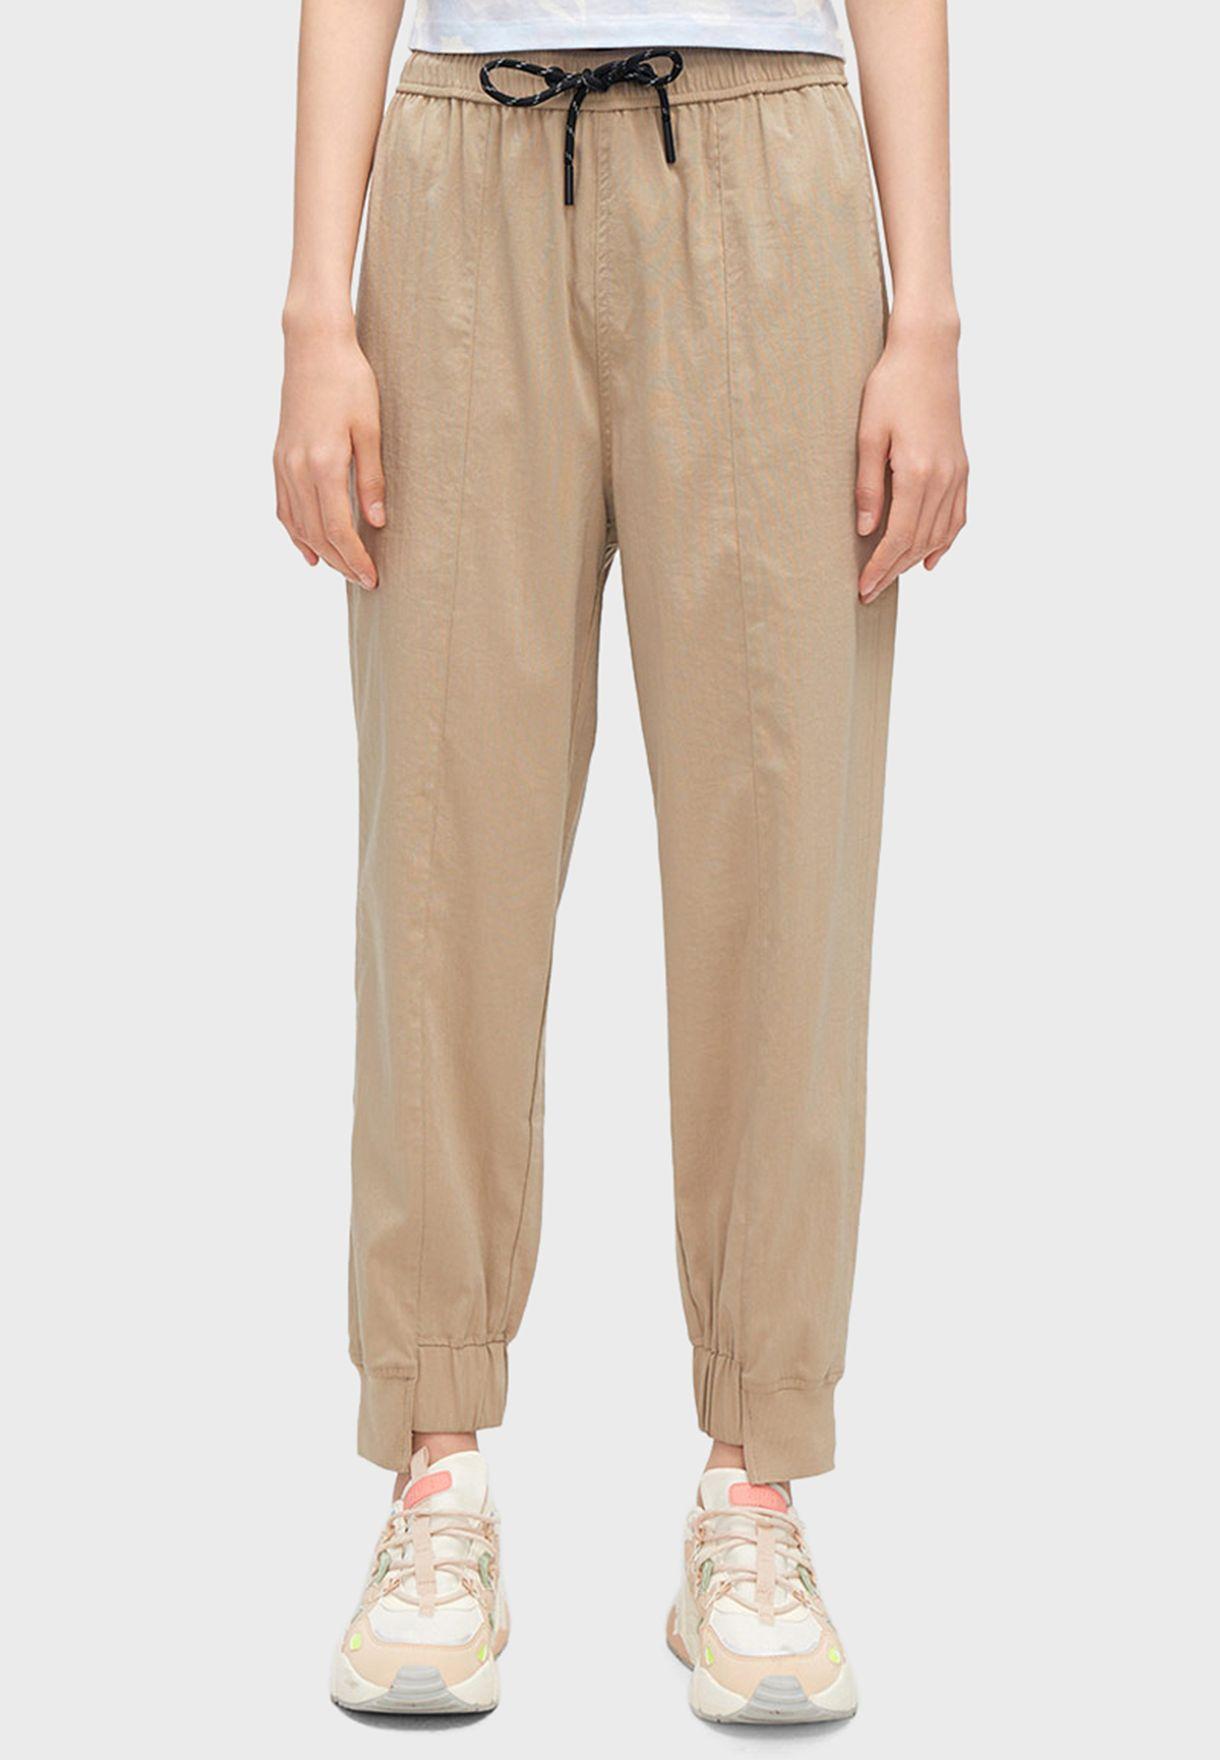 Cuffed Jogger Pants